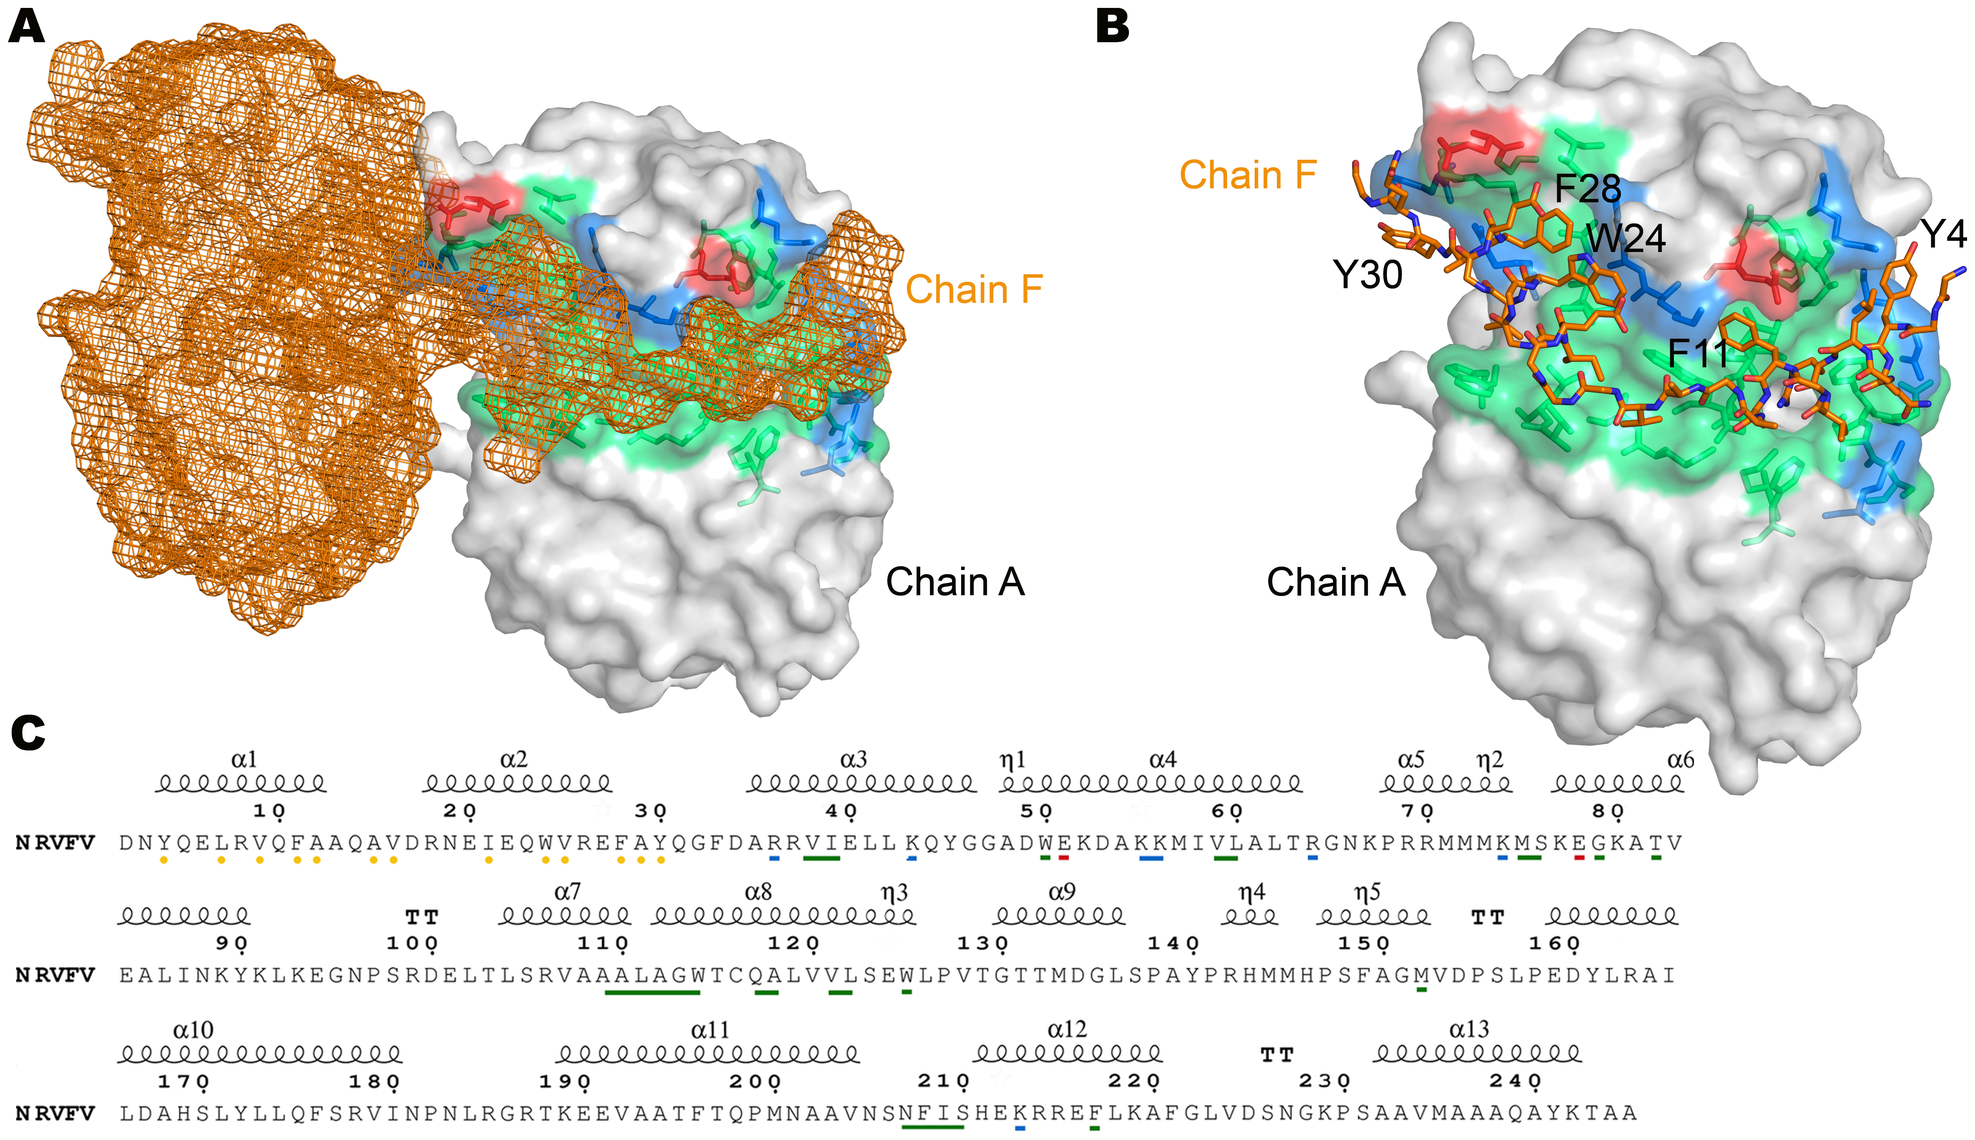 Interaction between adjacent N subunits in the hexamer.